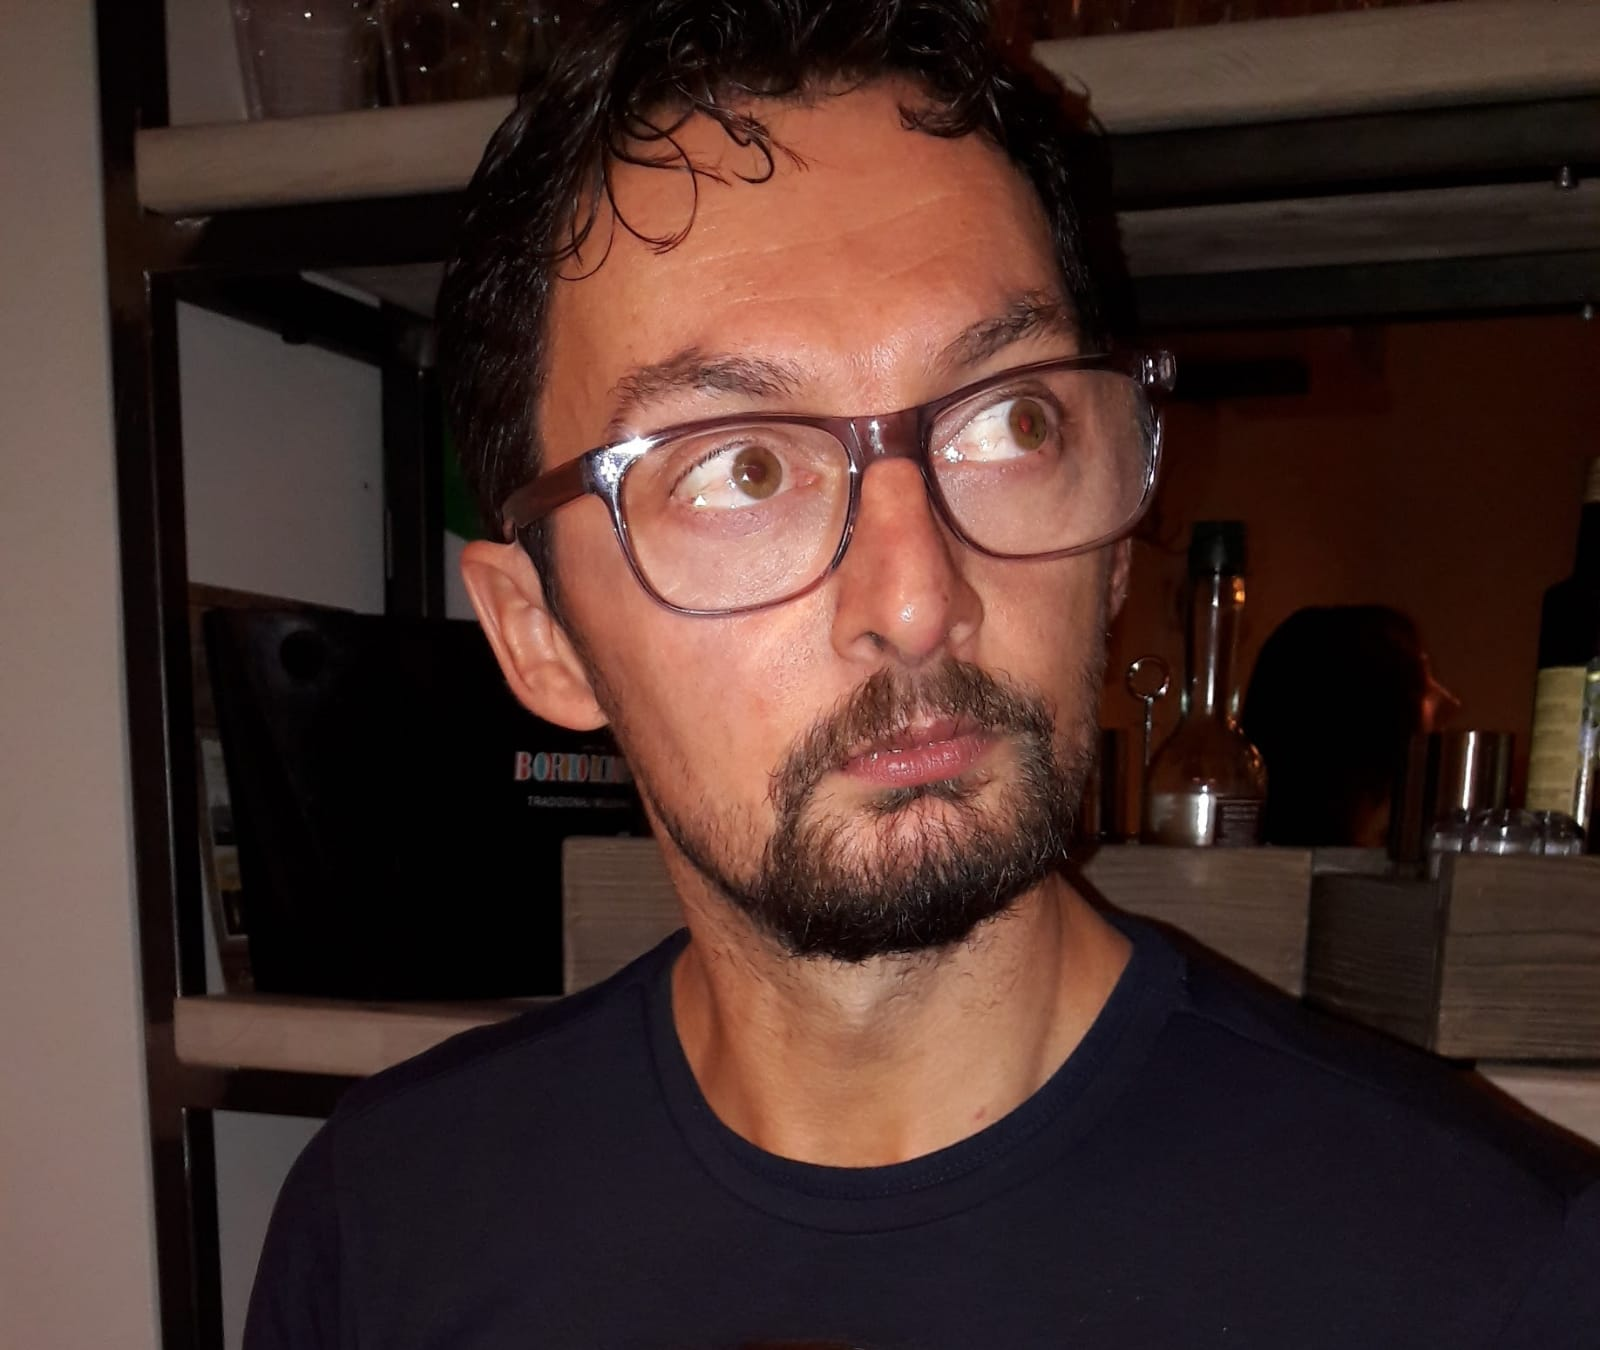 ALESSANDRO PAGANELLI